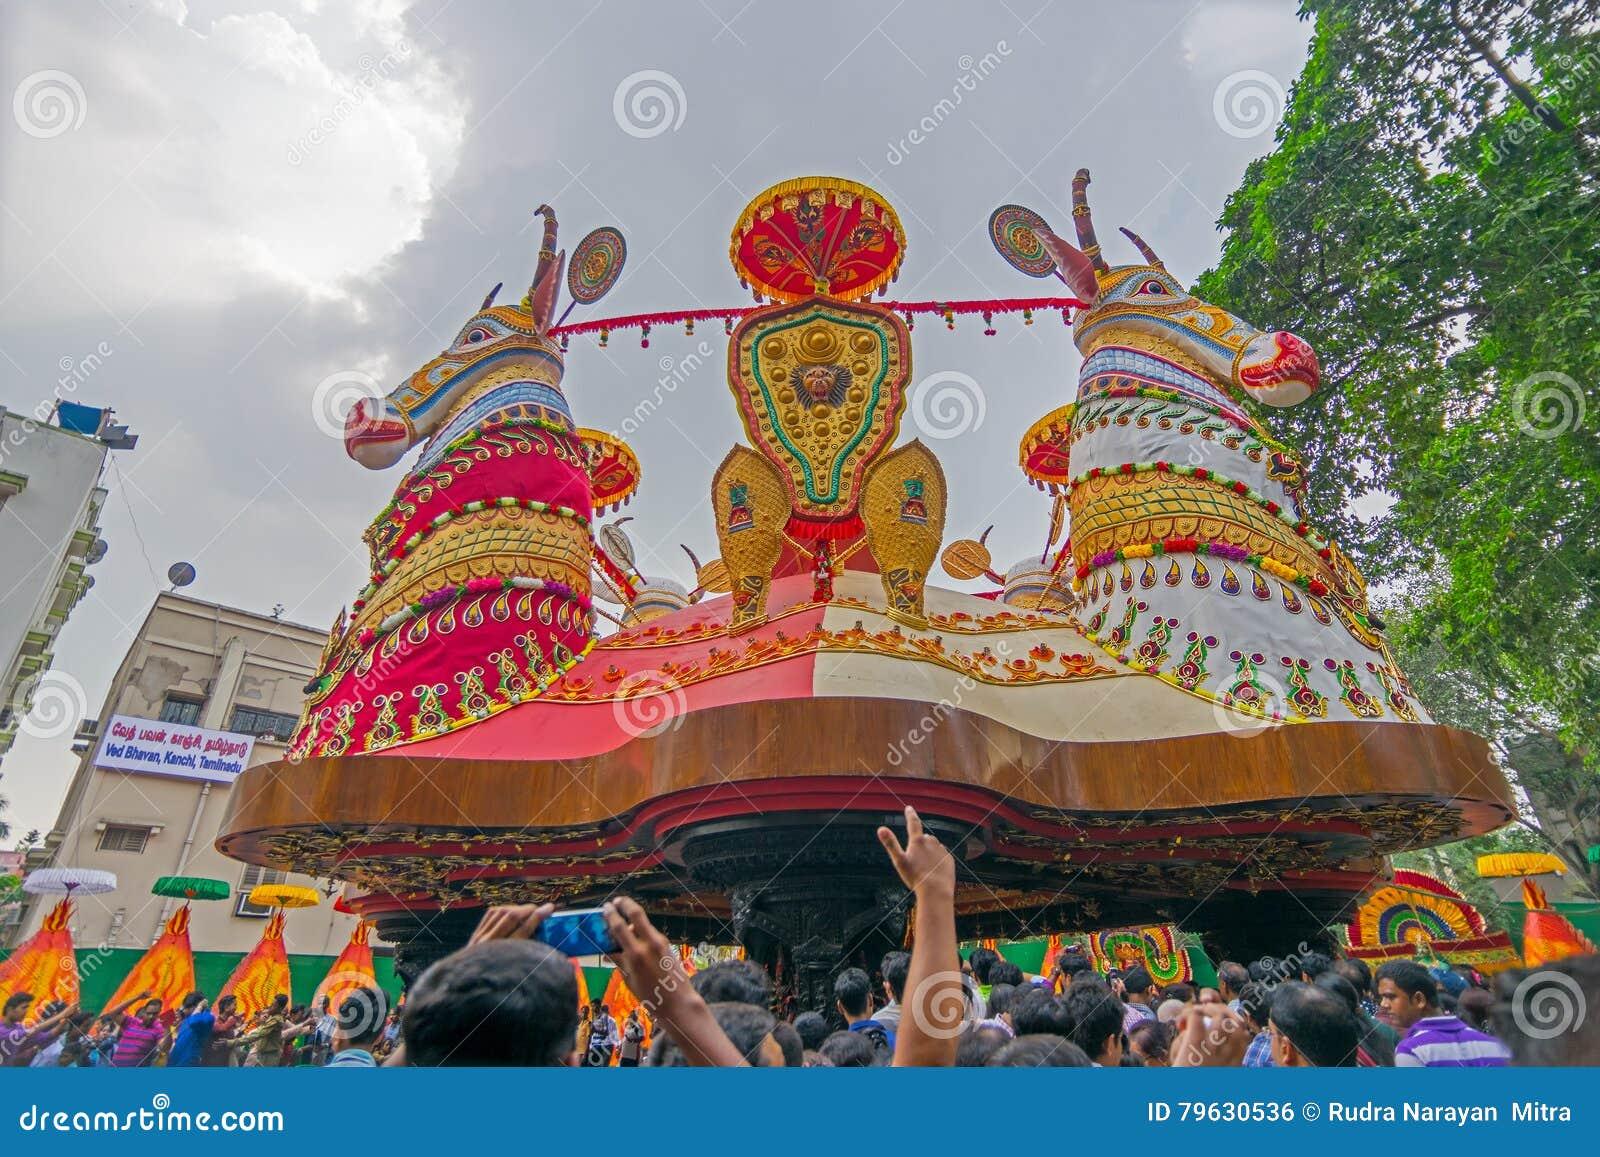 Pandal stock images download 453 photos exterior of decorated durga puja pandal at kolkata west bengal india kolkata altavistaventures Choice Image